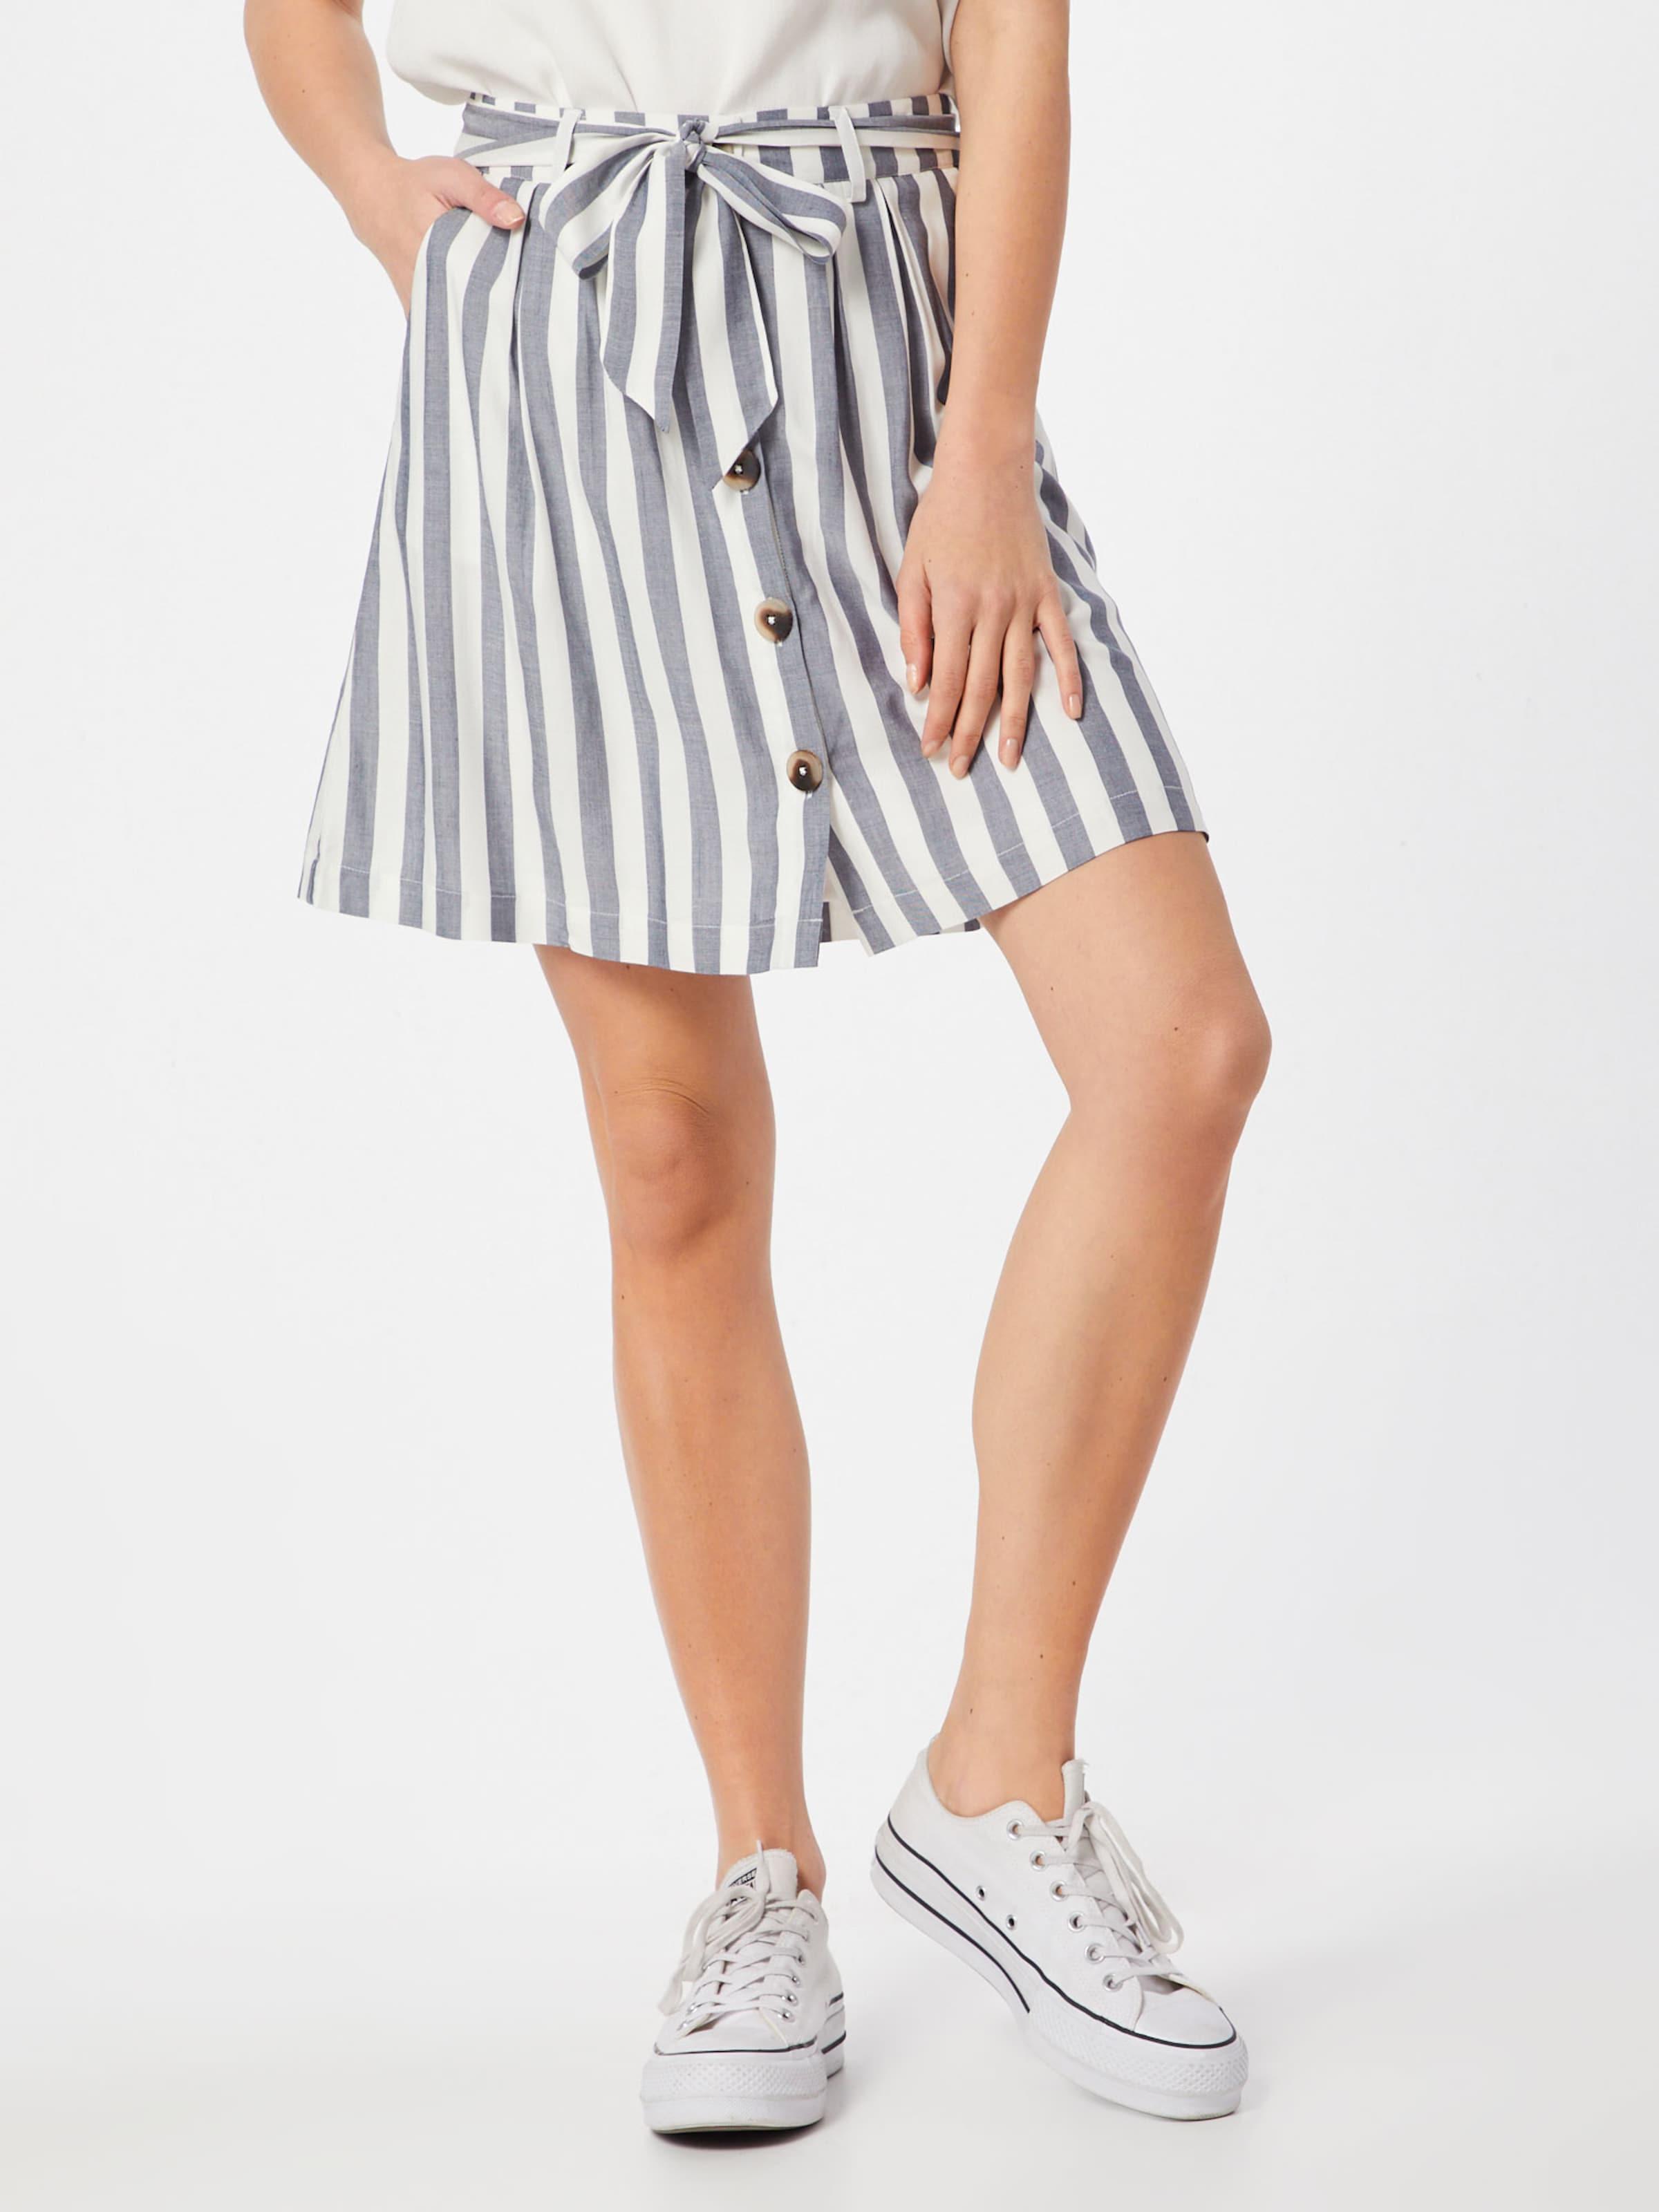 NavyWit Skirt' Vila Rok 'viharper In 1lFJc3uTK5